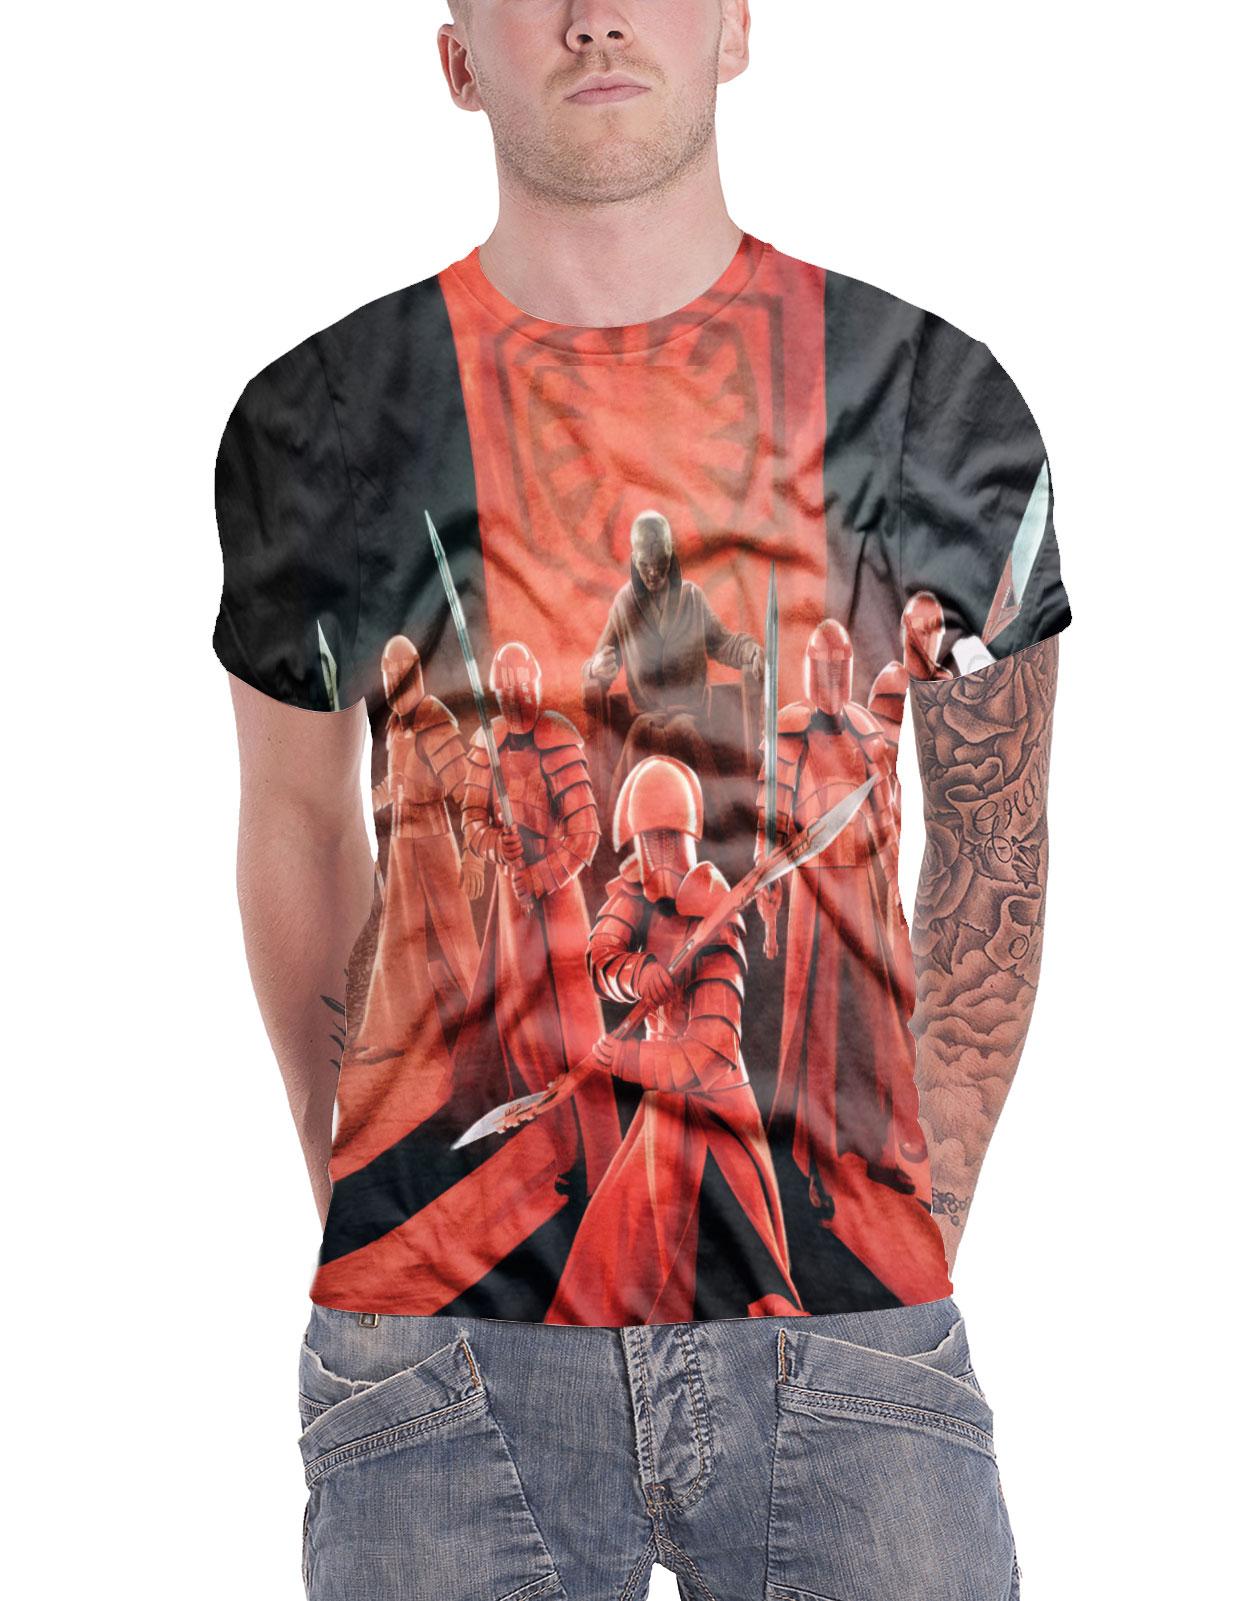 Snoke/'s Praetorian Guards Allover T-Shirt S-XXL Officially Licensed Star Wars